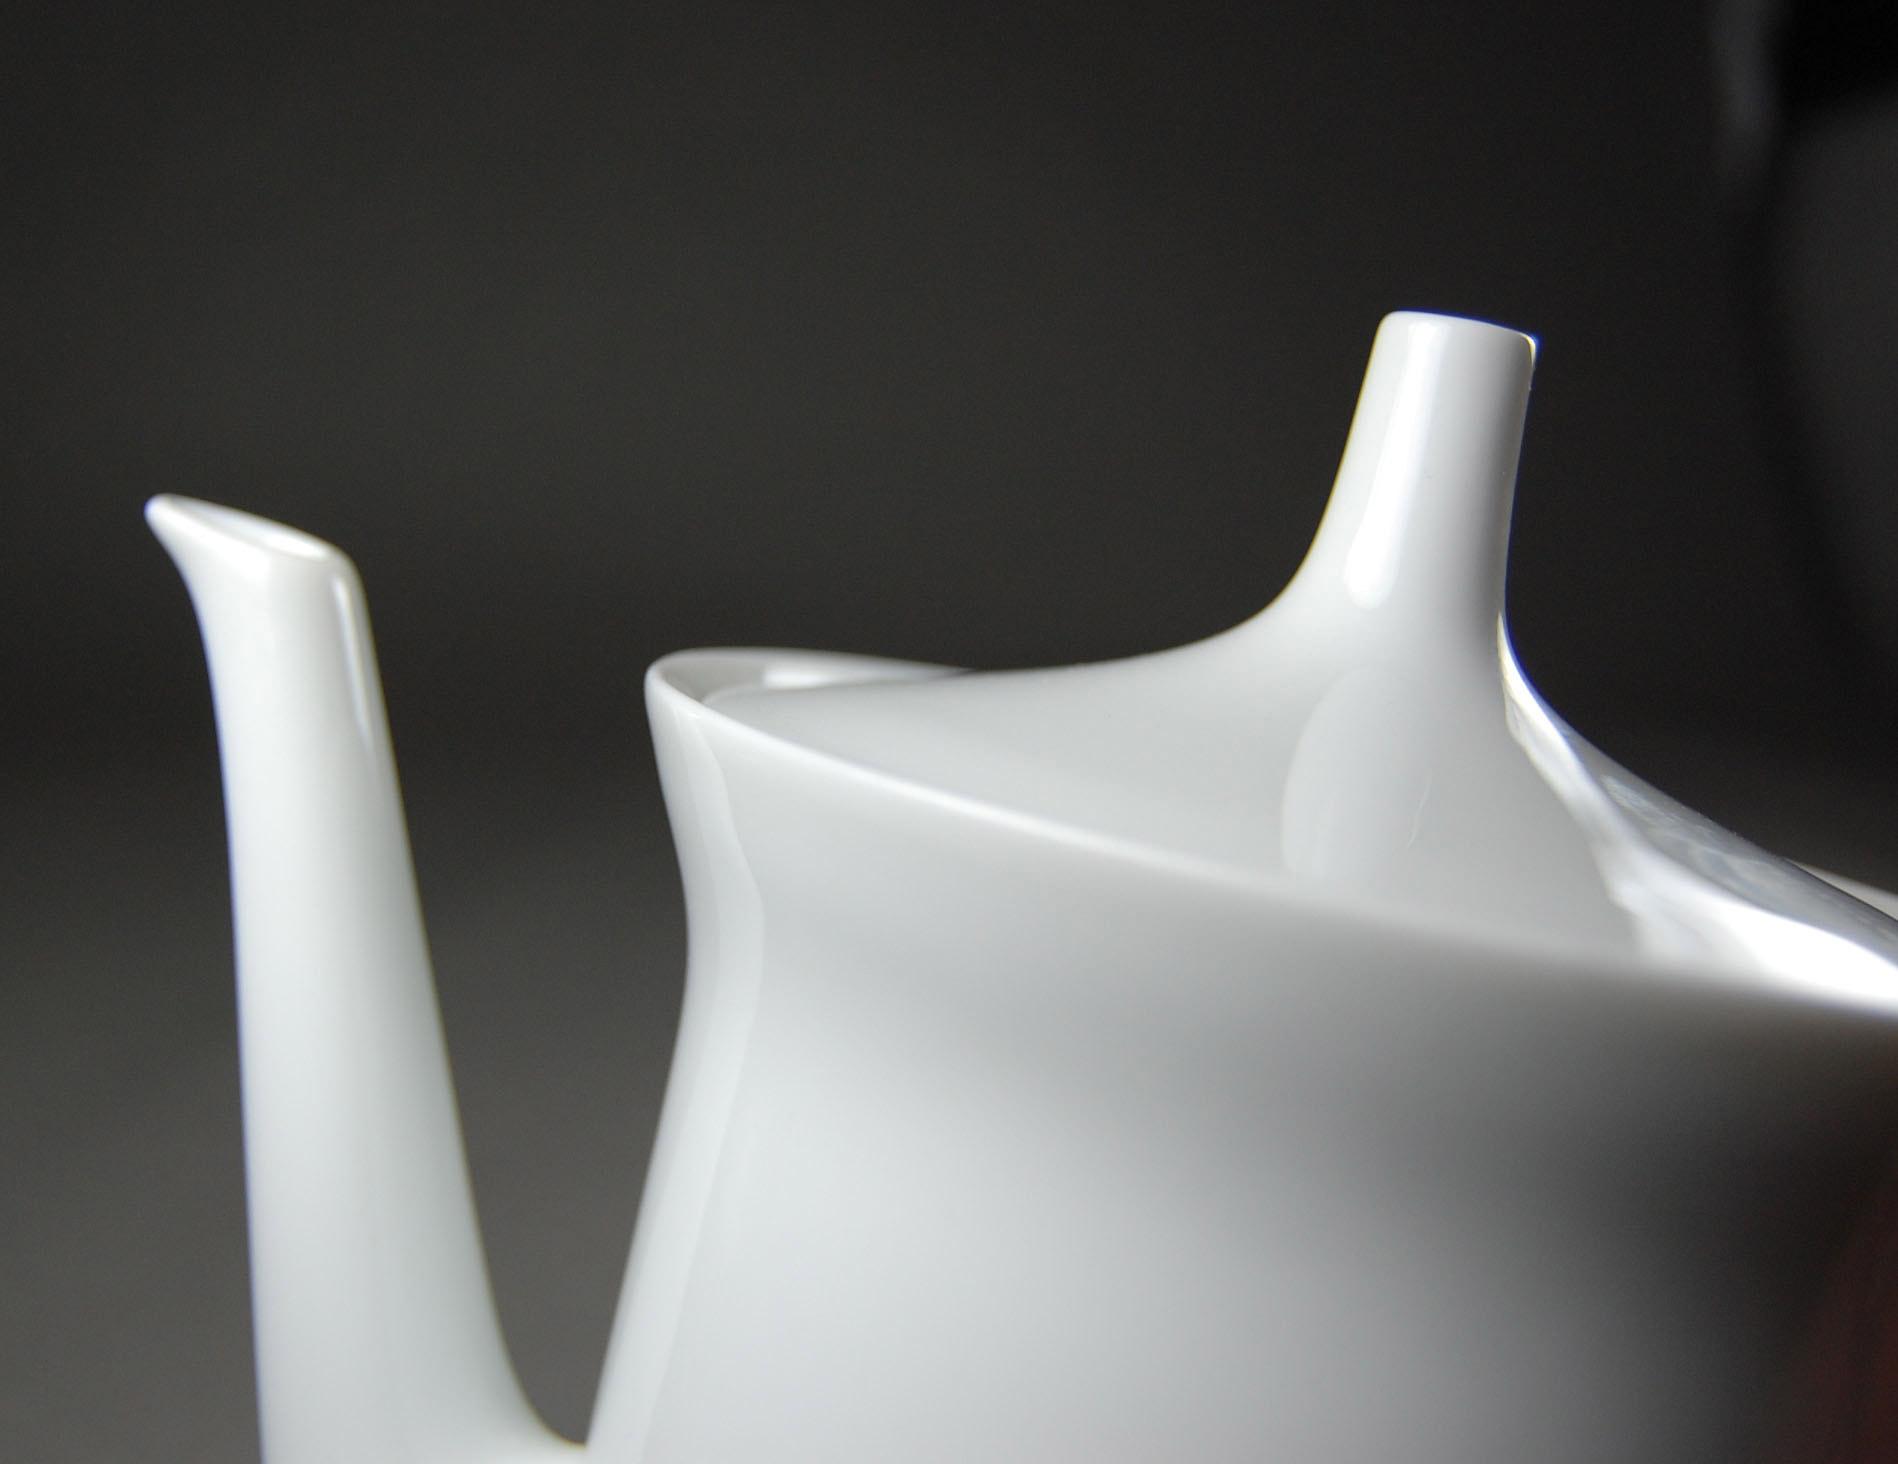 rosenthal service berlin kaffeekanne design und. Black Bedroom Furniture Sets. Home Design Ideas